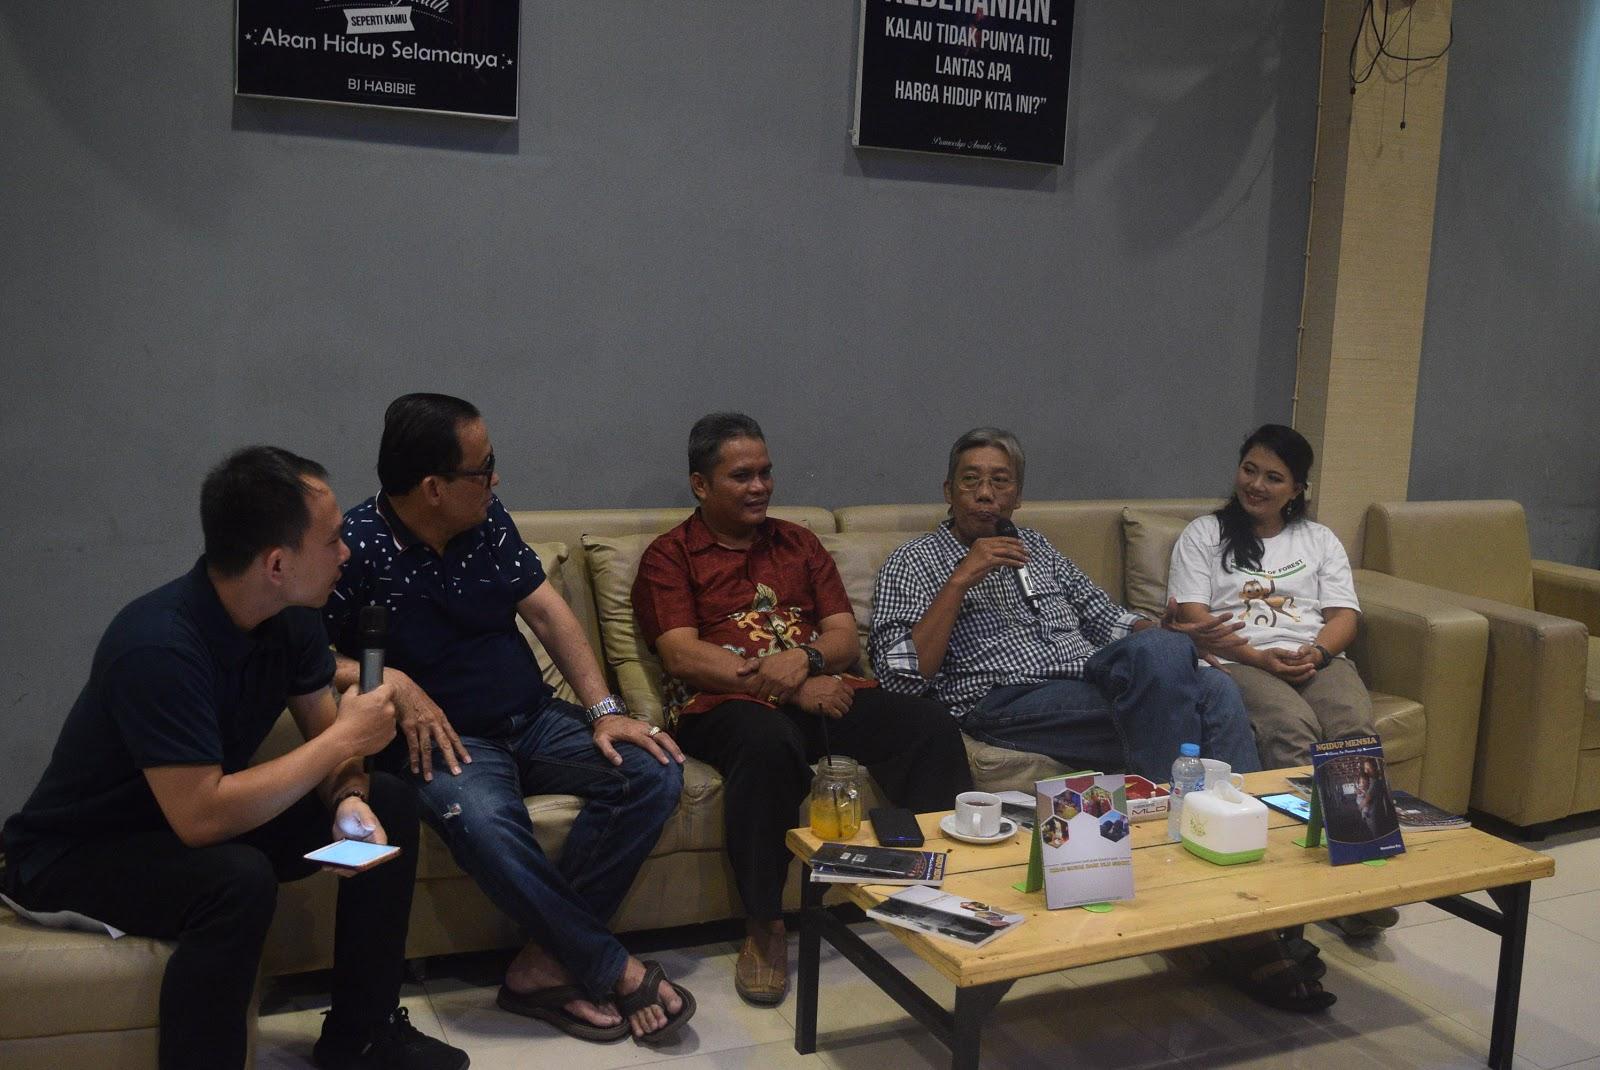 Bupati Sintang ,Jarot Winarno Beri Motivasi dalam Launching Buku dan Filem Domumenter